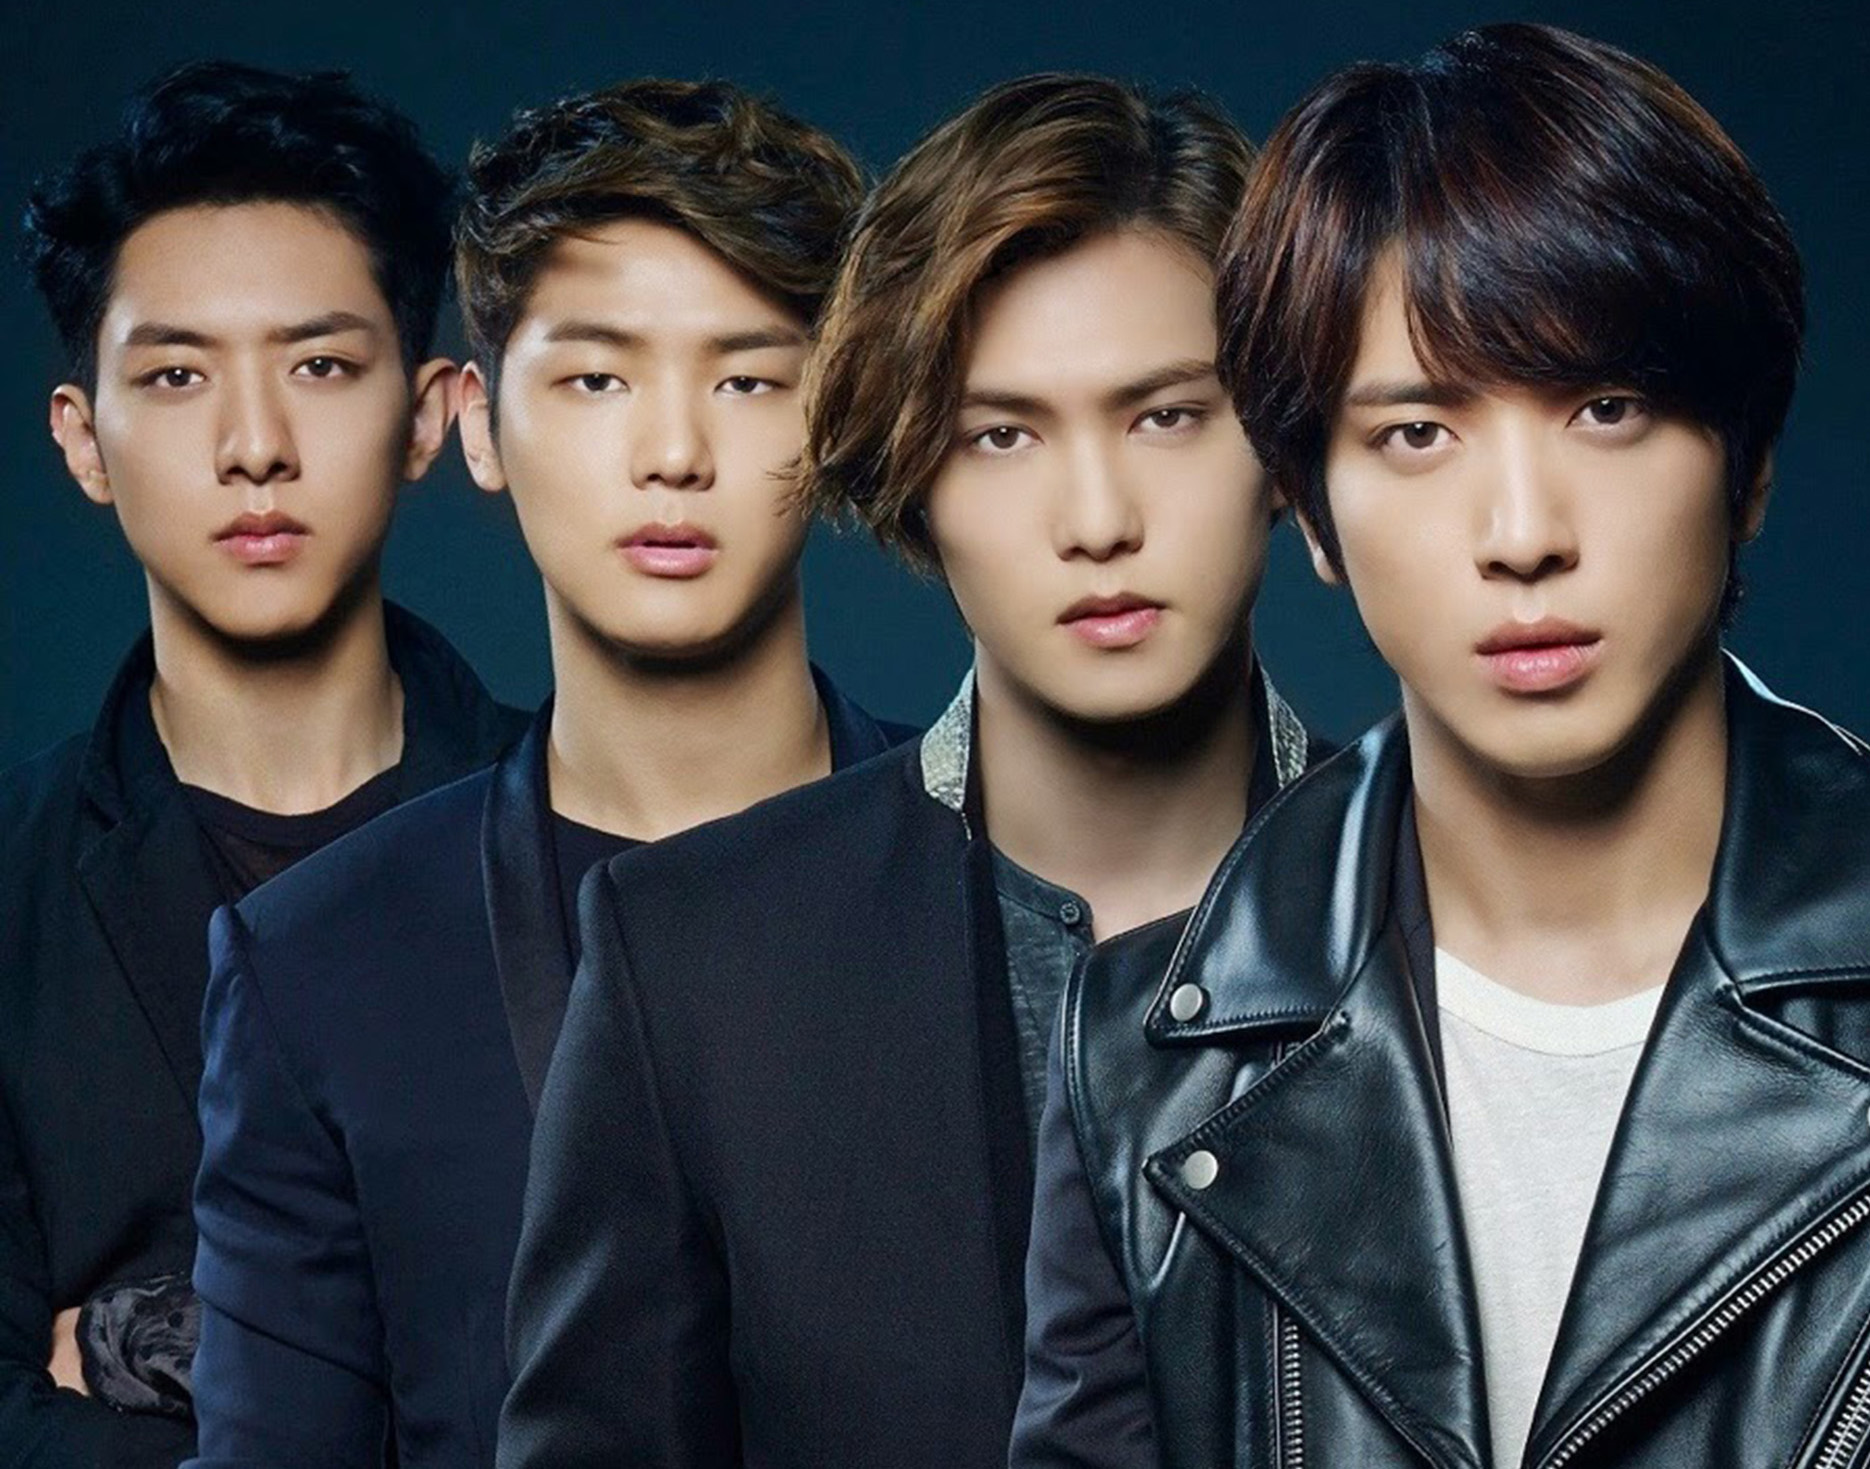 Image Result For Jonghyun Cnblue